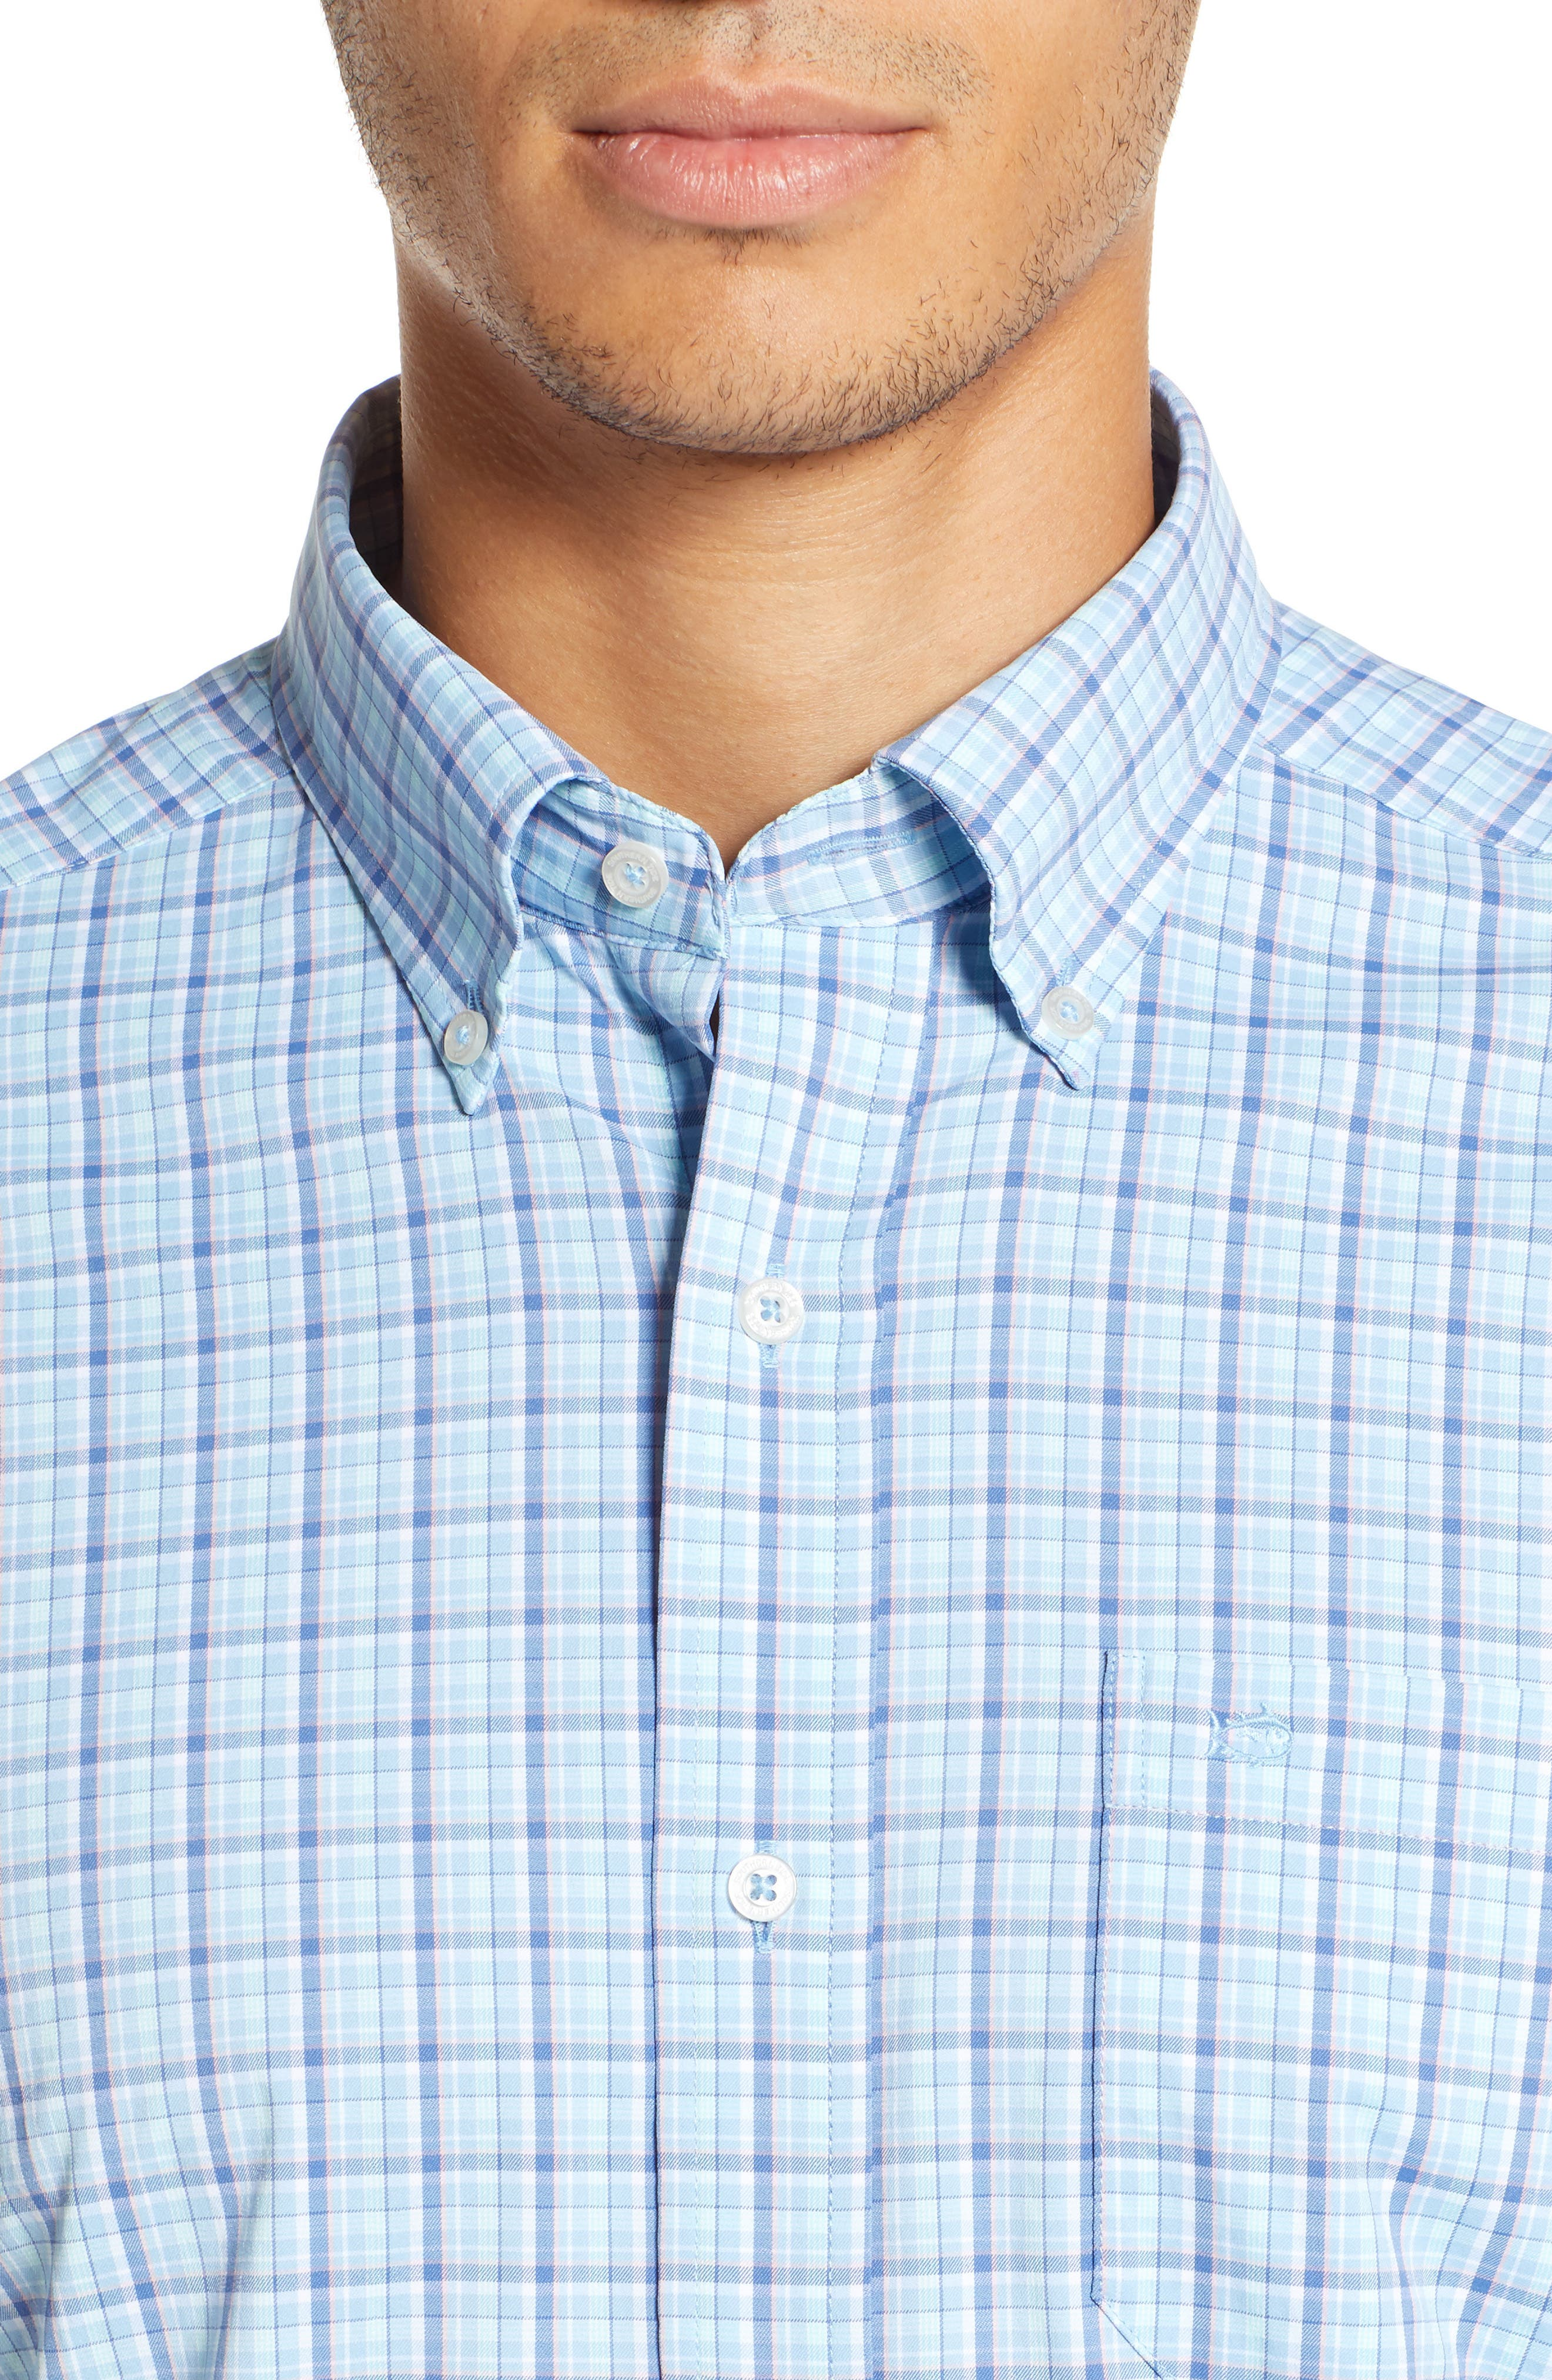 Staycation Intercoastal Regular Fit Plaid Performance Sport Shirt,                             Alternate thumbnail 2, color,                             SKY BLUE